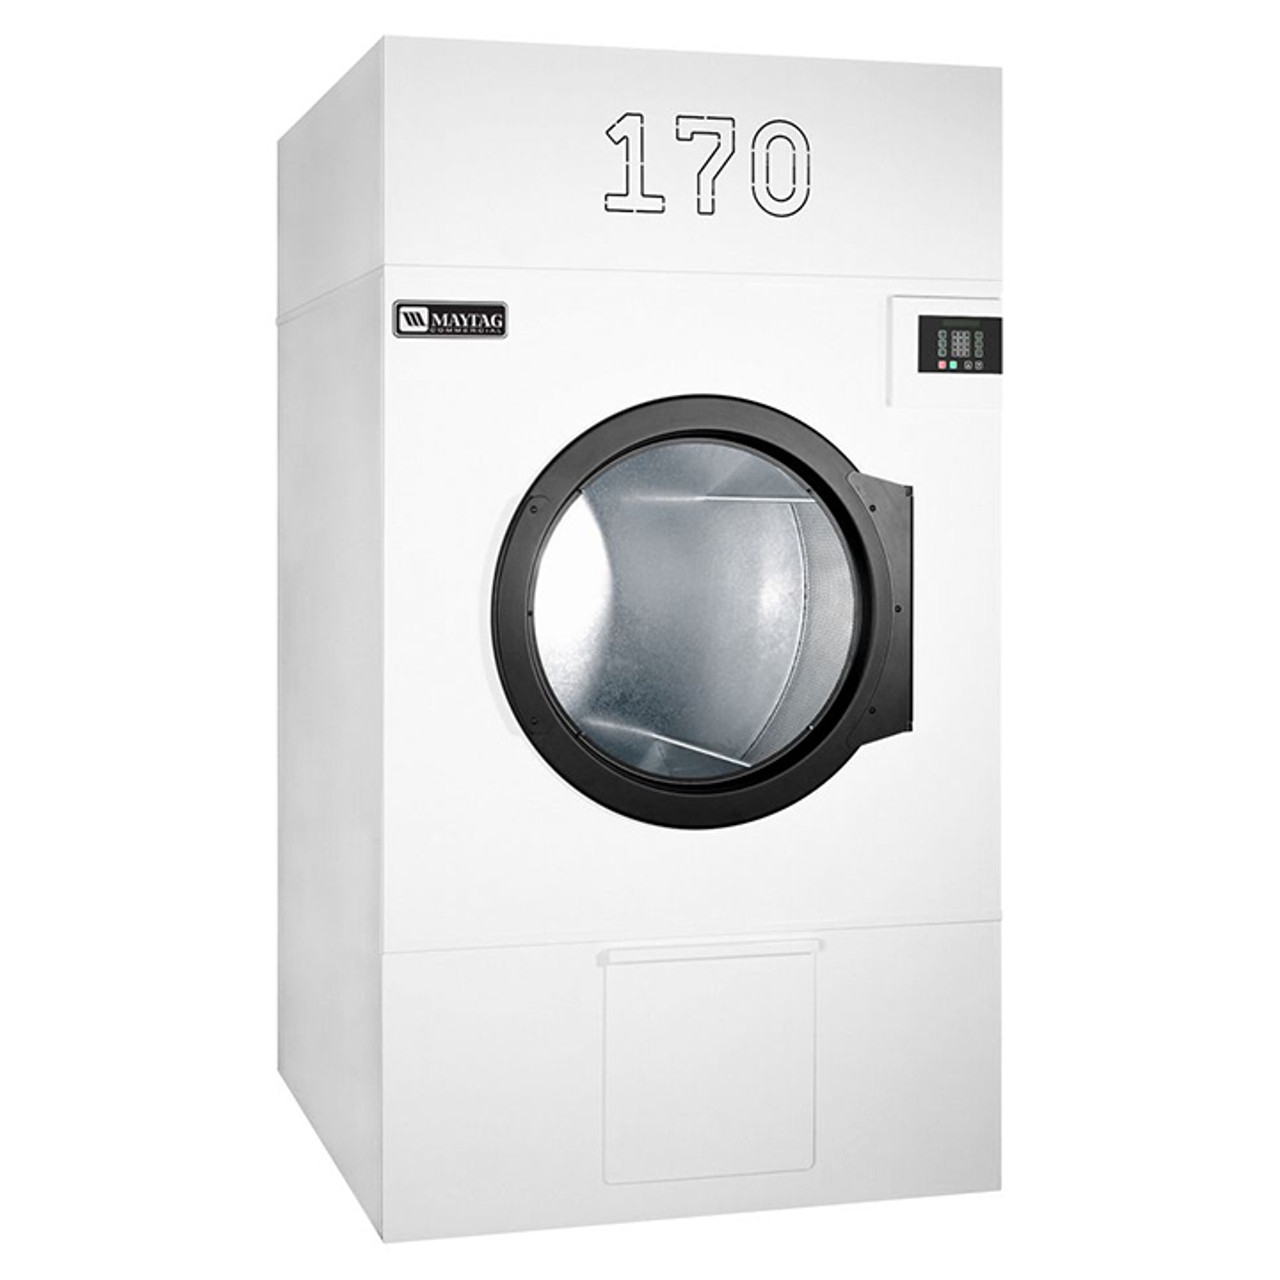 Maytag MDG170PJ - Maytag Commercial 170lb OPL Dryer - Traditional Line